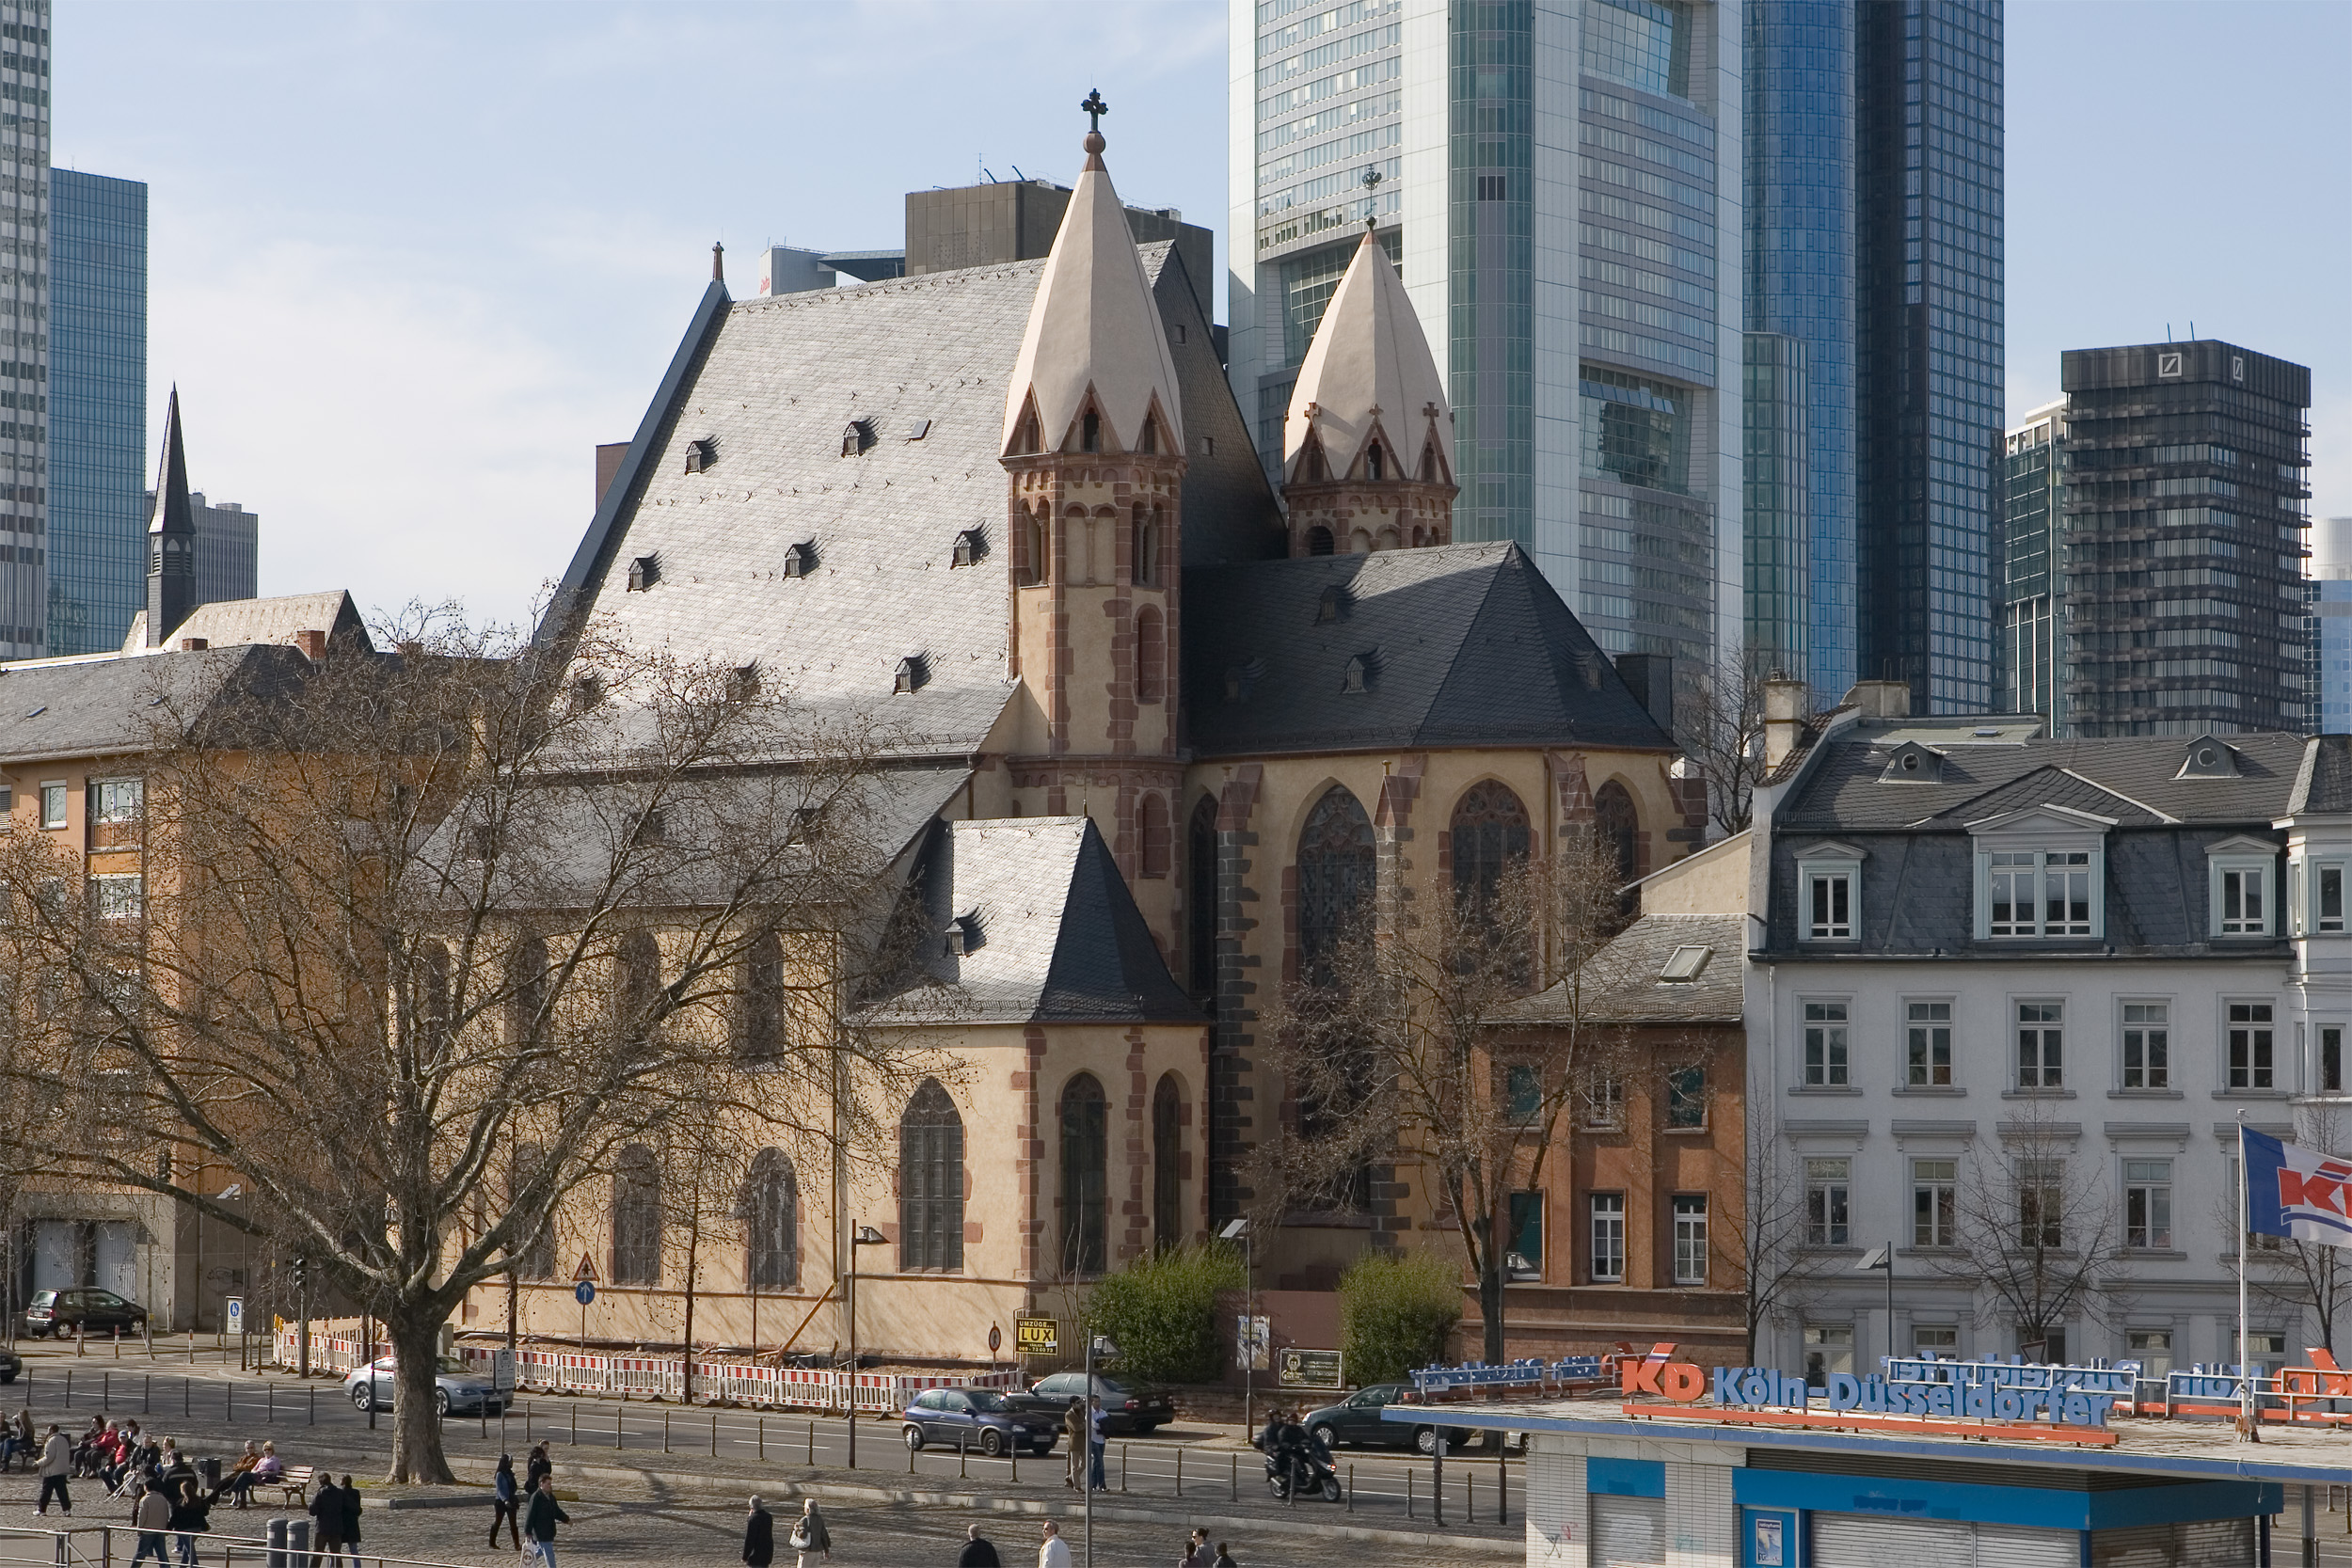 leonhardskirche frankfurt am main wikiwand. Black Bedroom Furniture Sets. Home Design Ideas